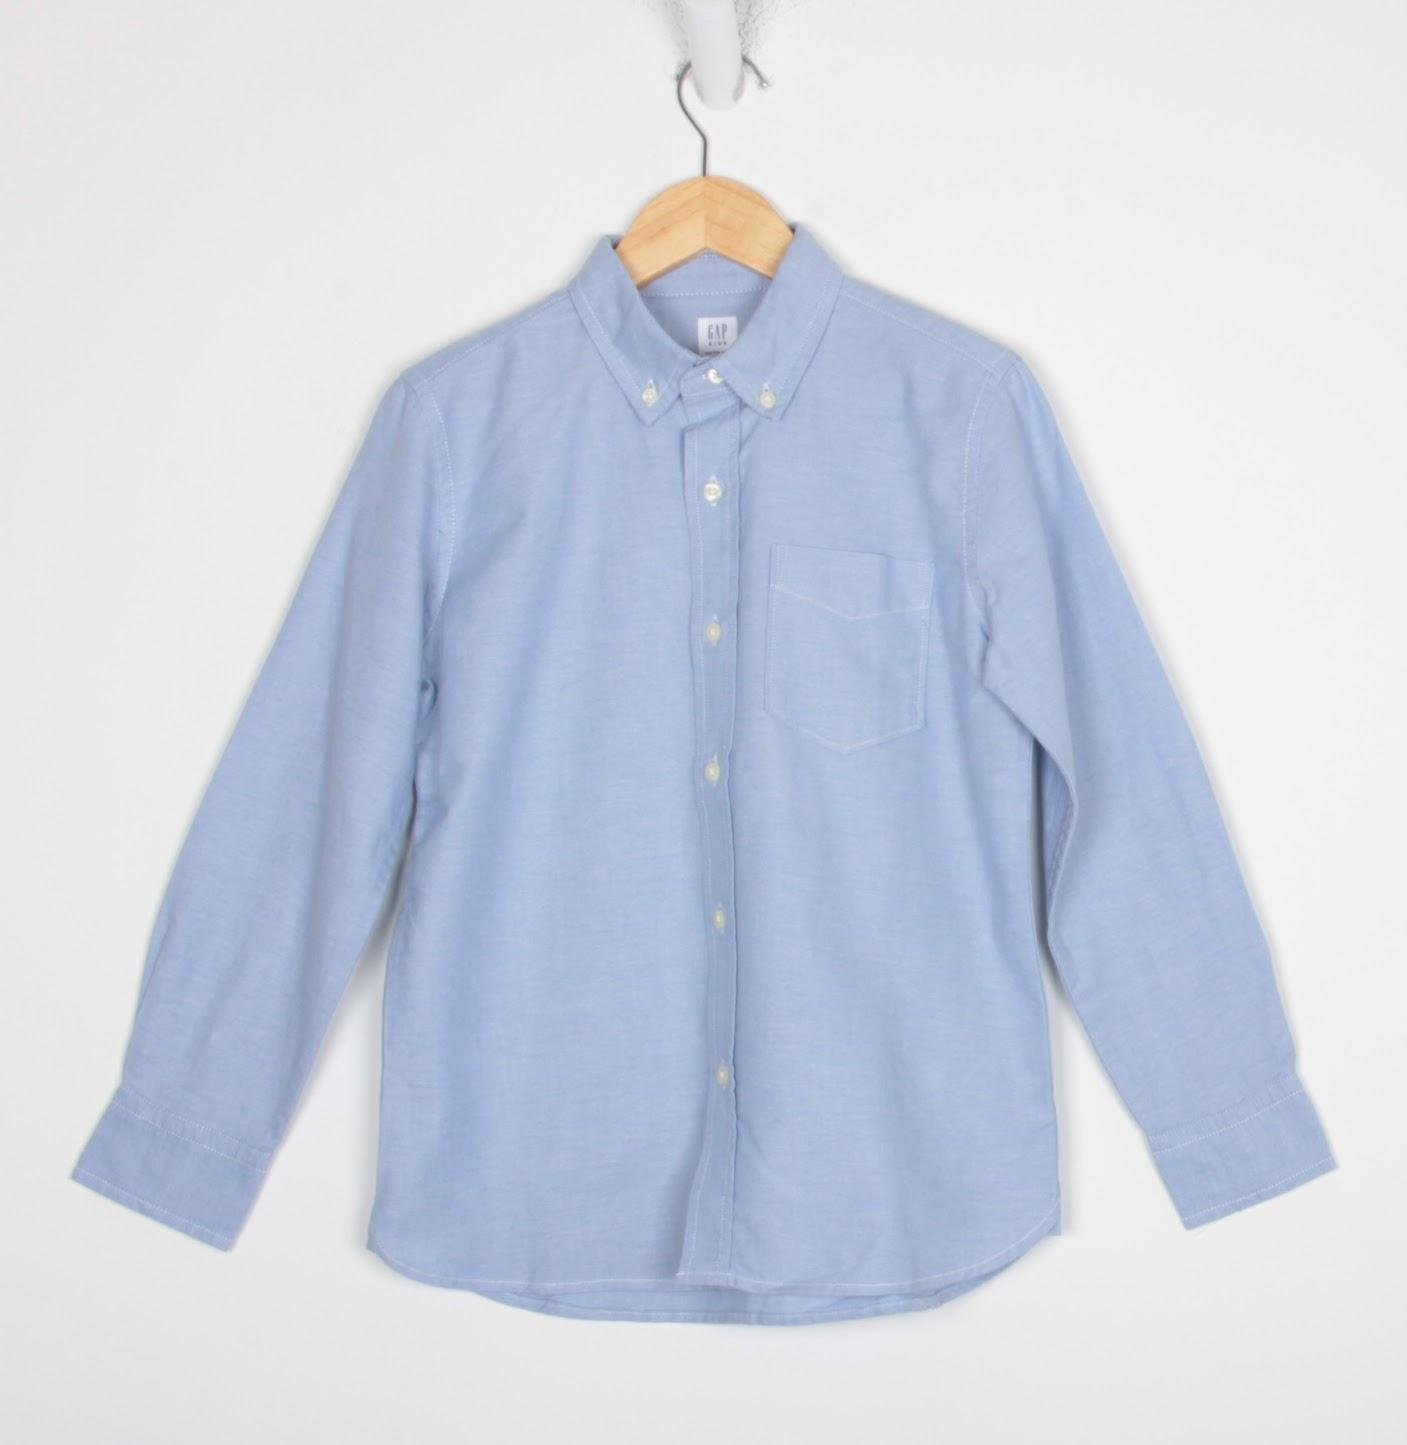 Camisa Manga Longa - Gap - 08 Anos